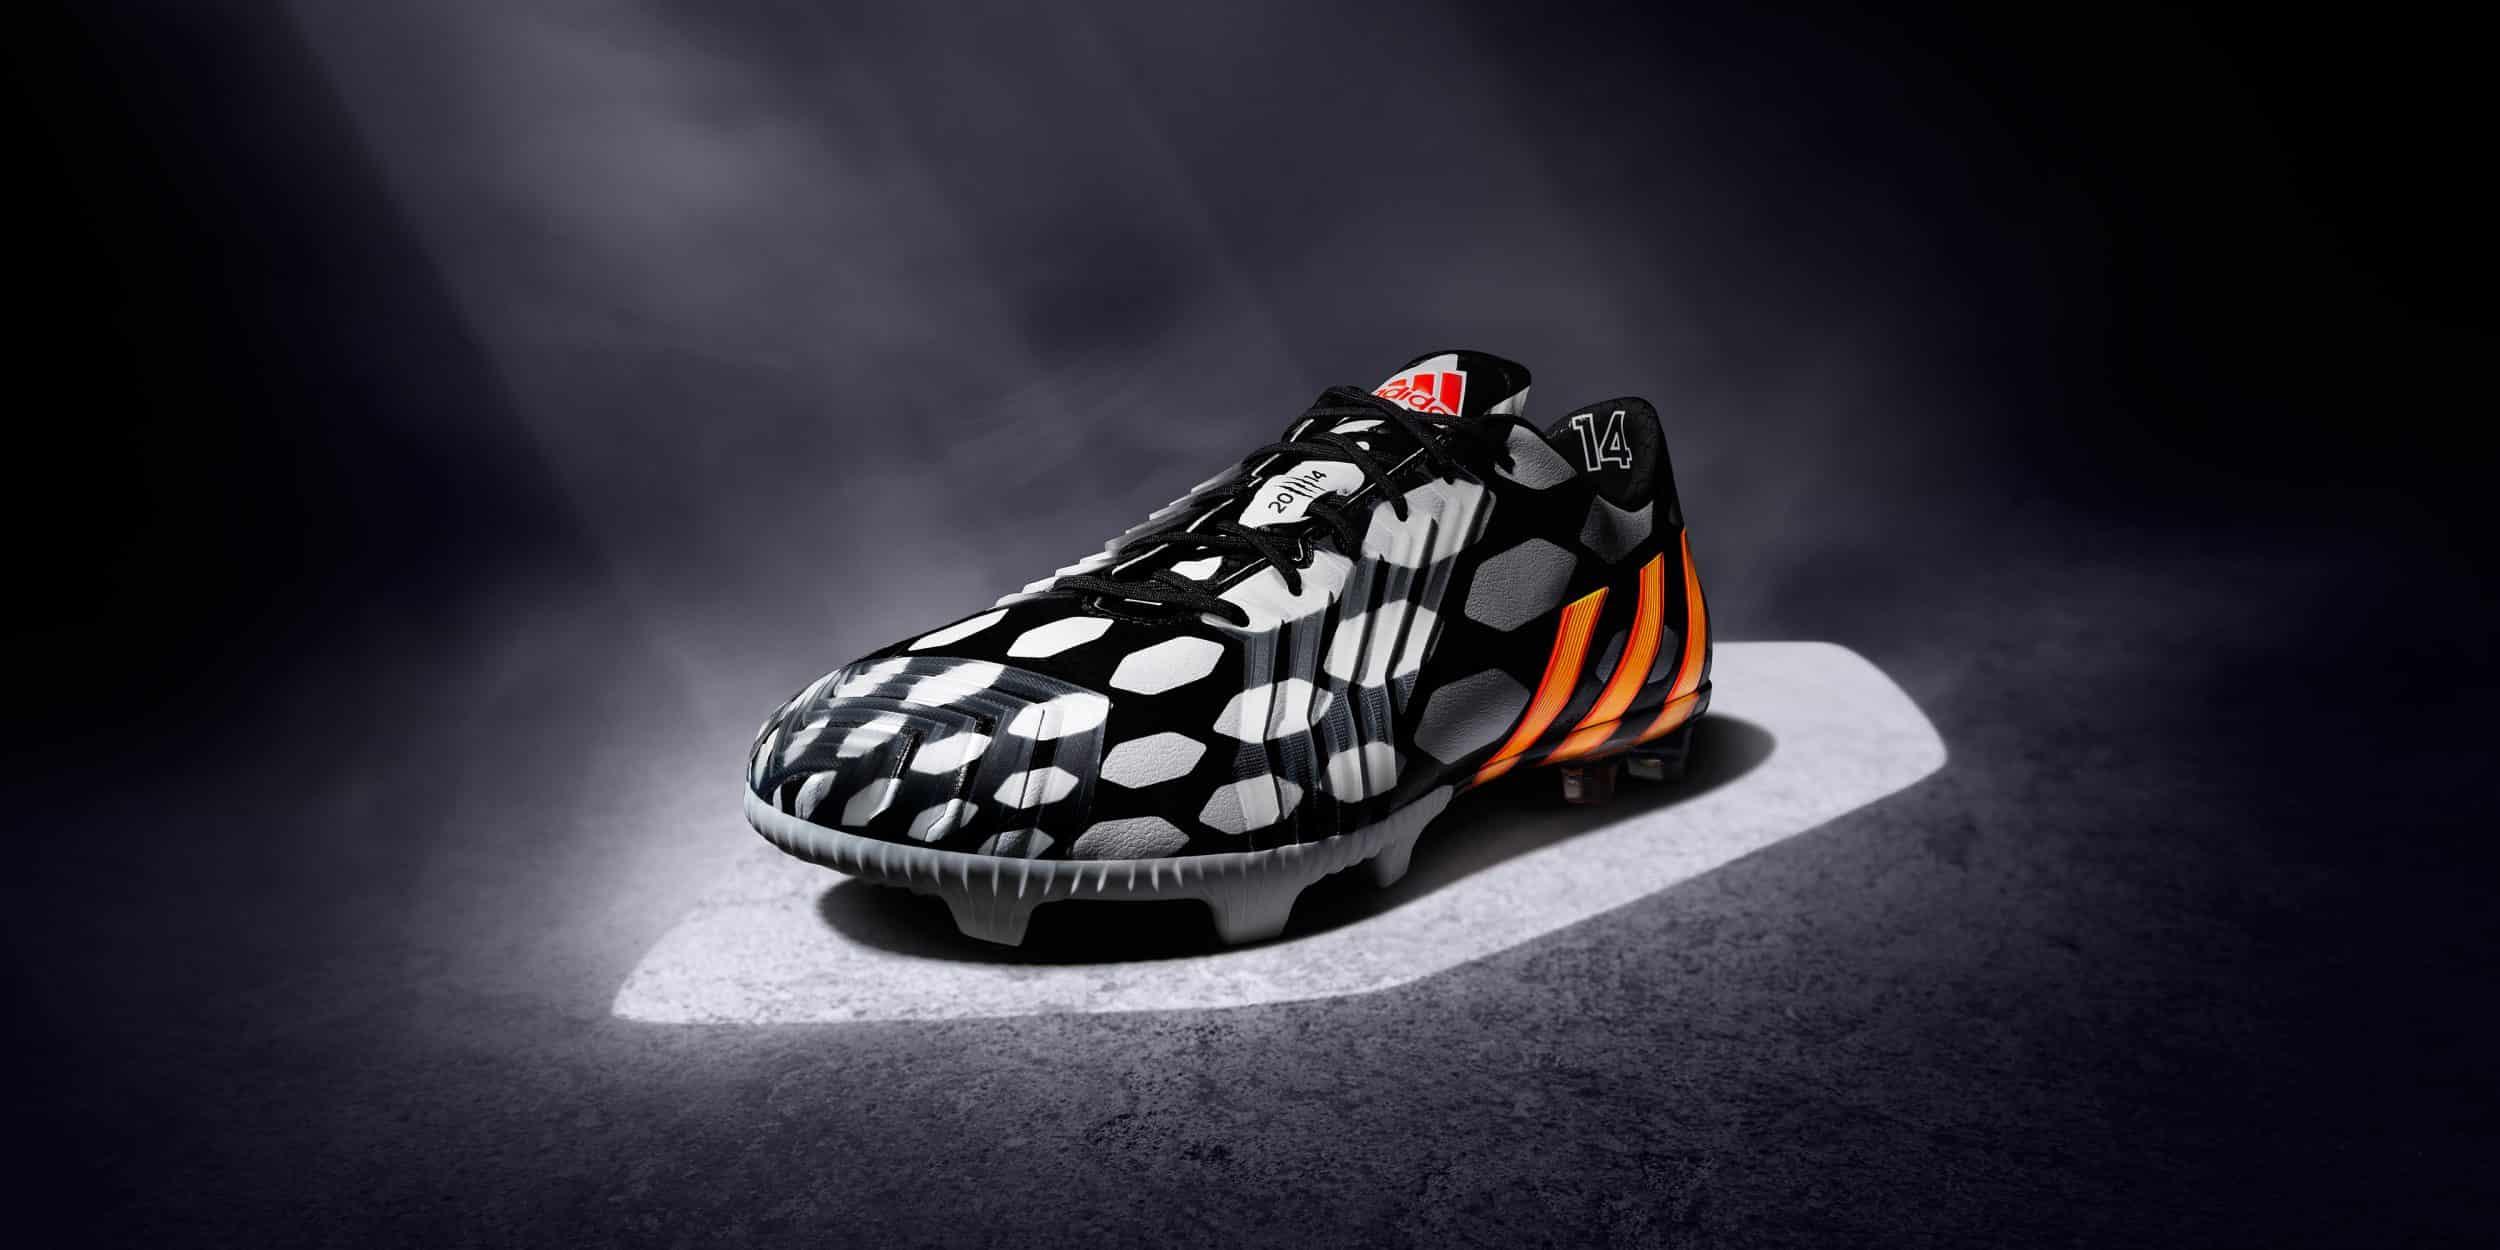 chaussures-football-adidas-predator-battle-pack-img1